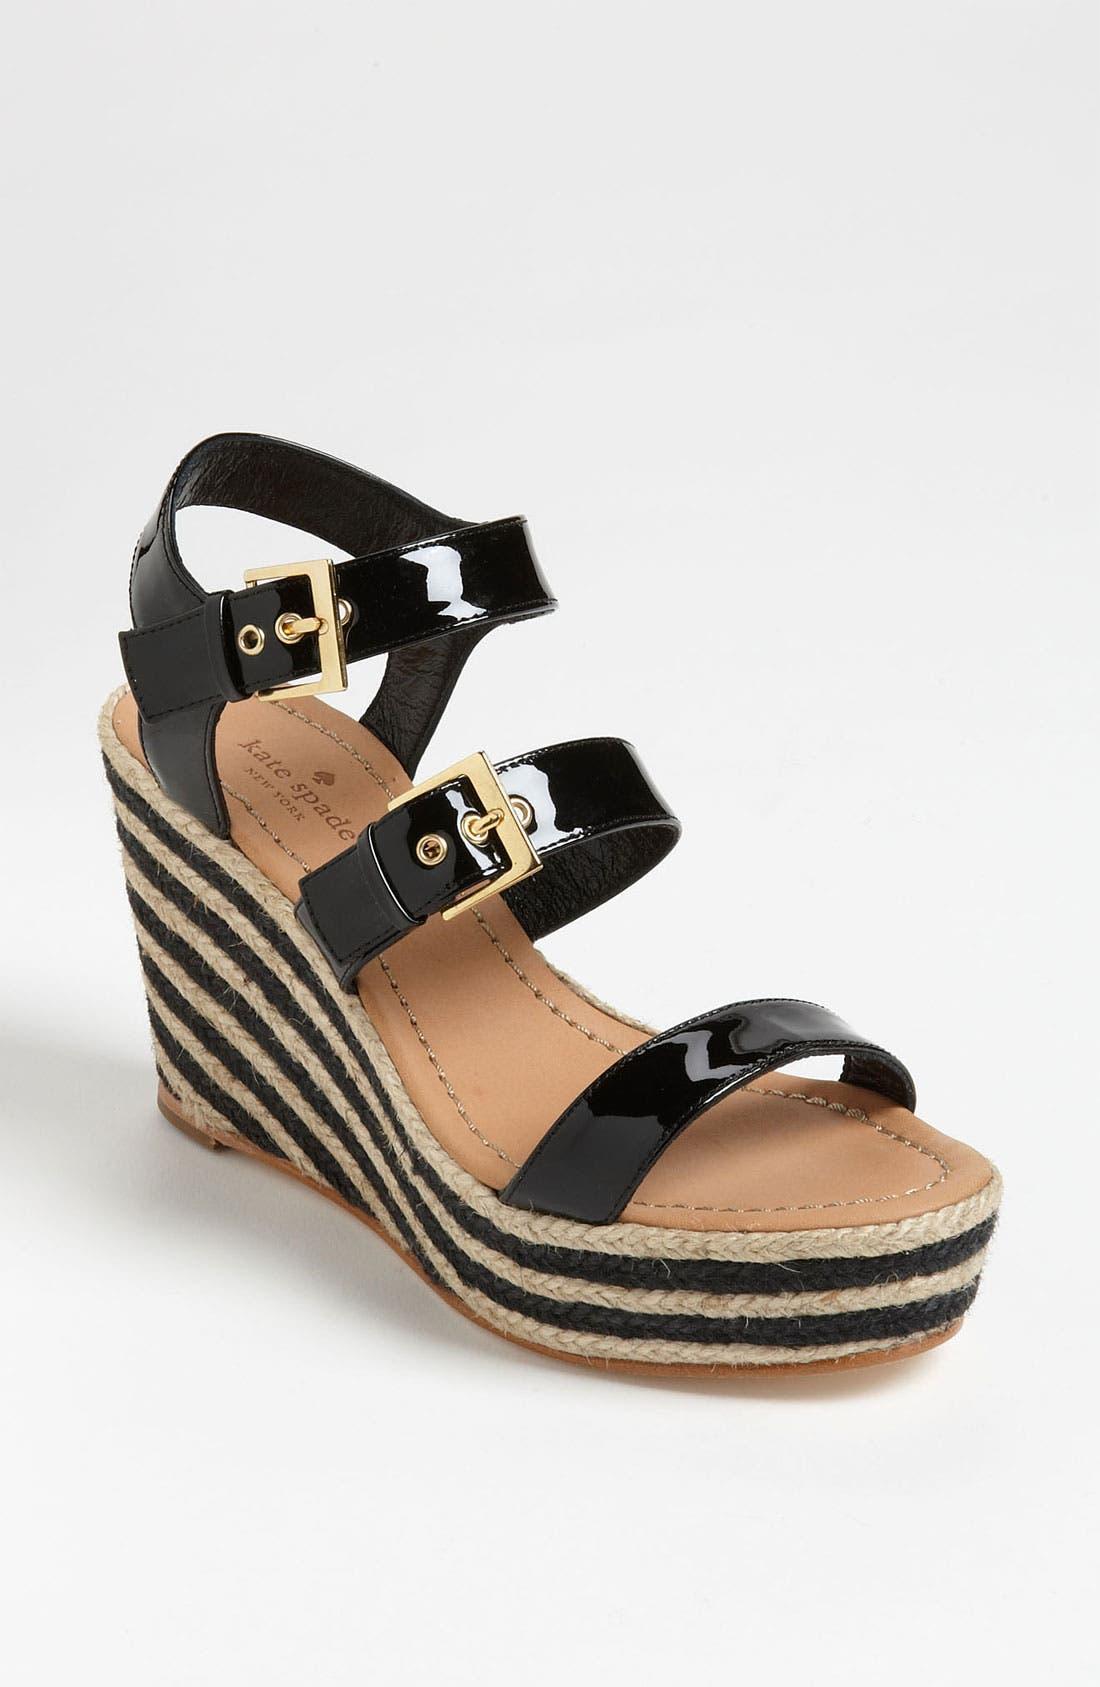 Main Image - kate spade new york 'darla' sandal